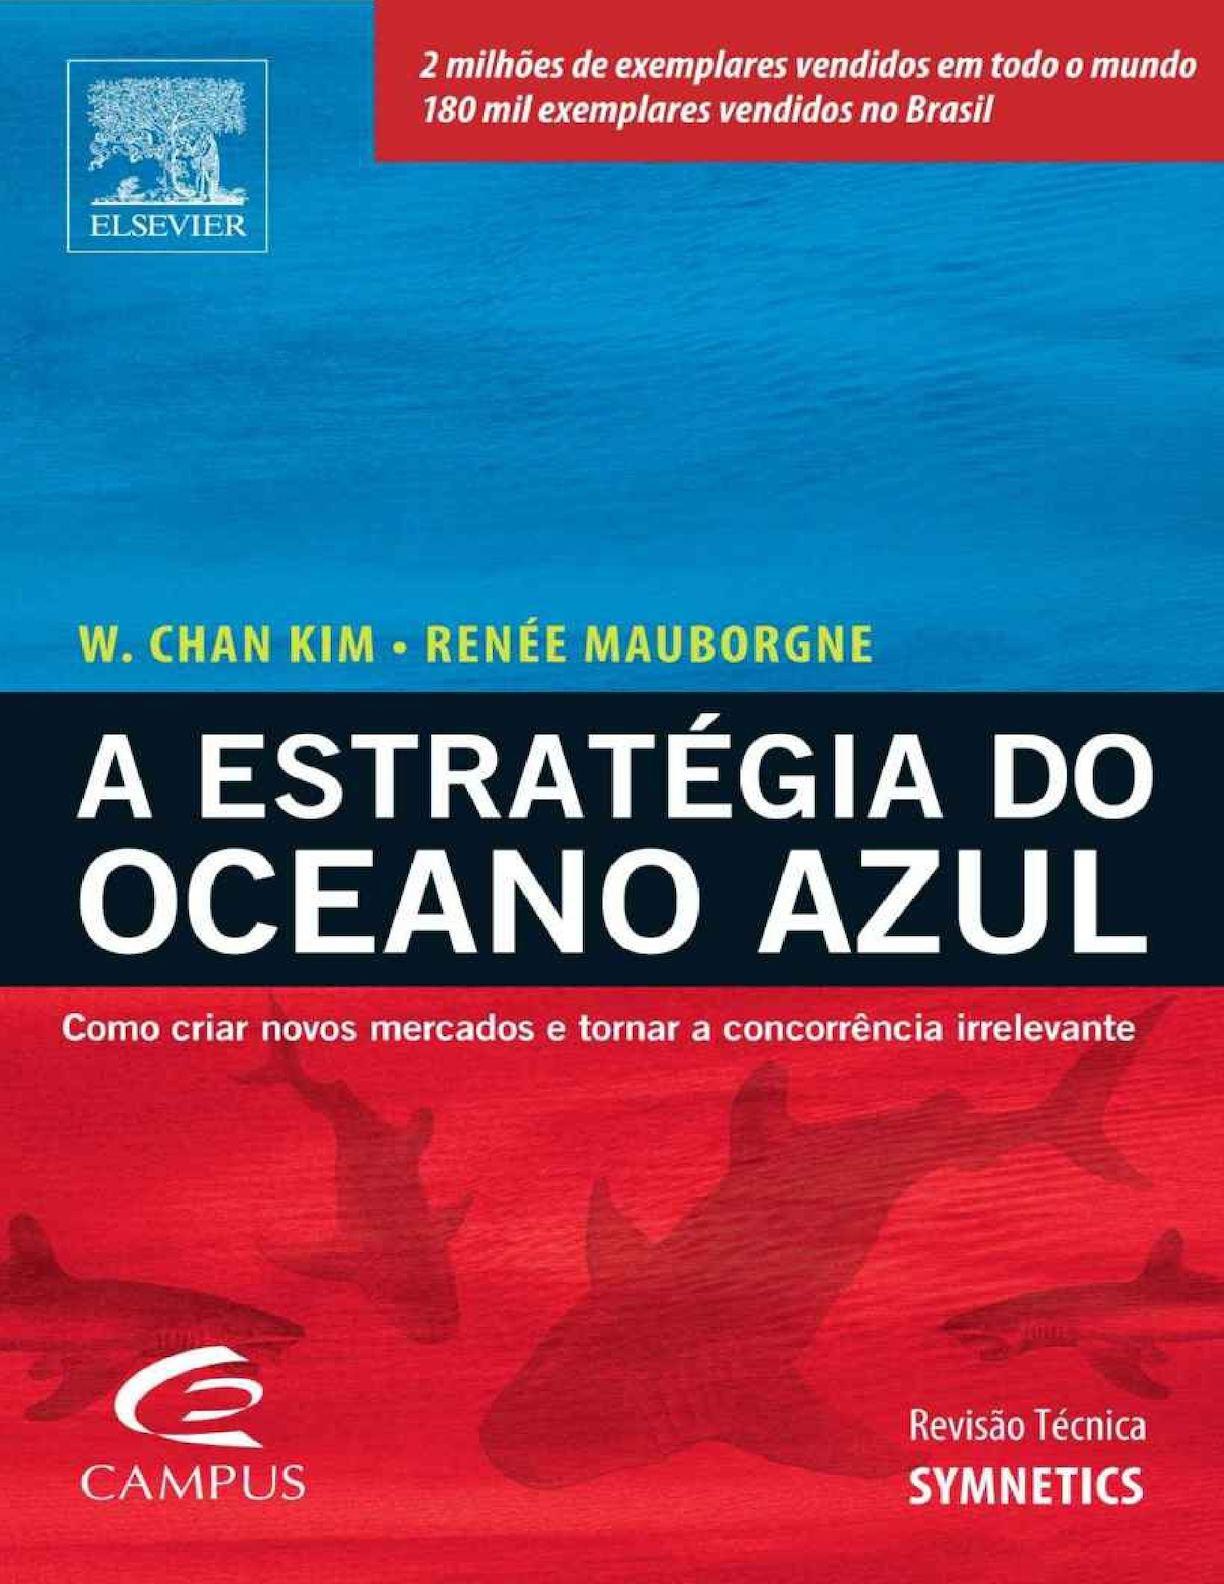 c6e22472e Calaméo - A ESTRATEGIA DO OCEANO AZUL